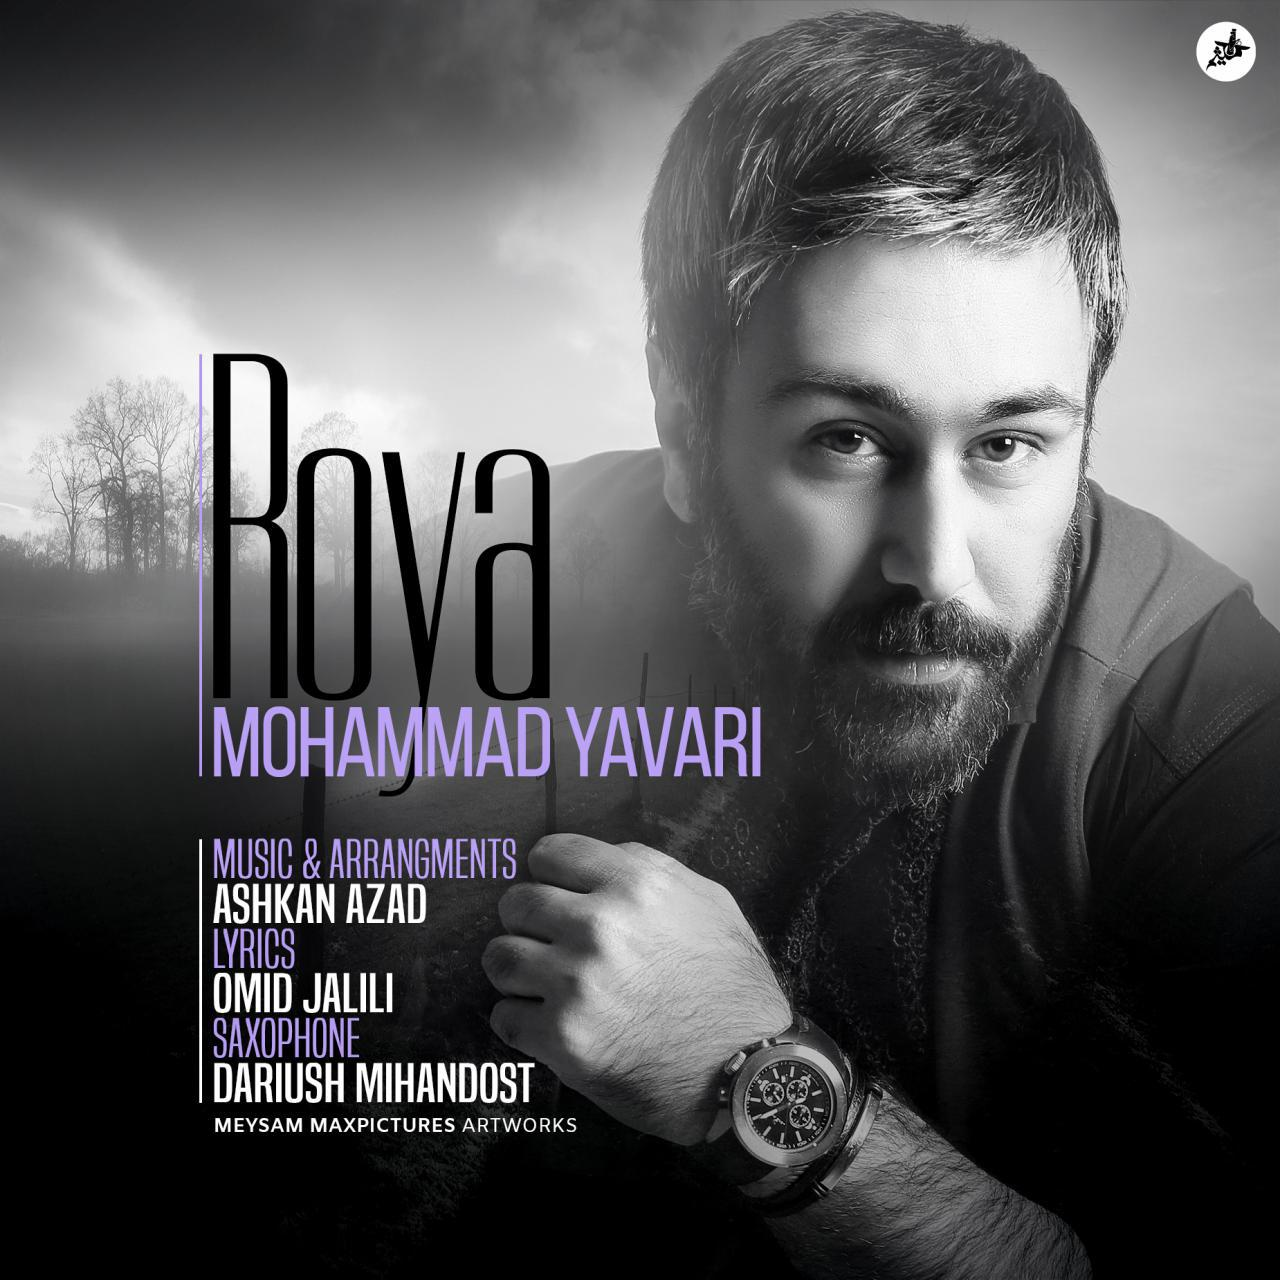 محمد یاوری رویا